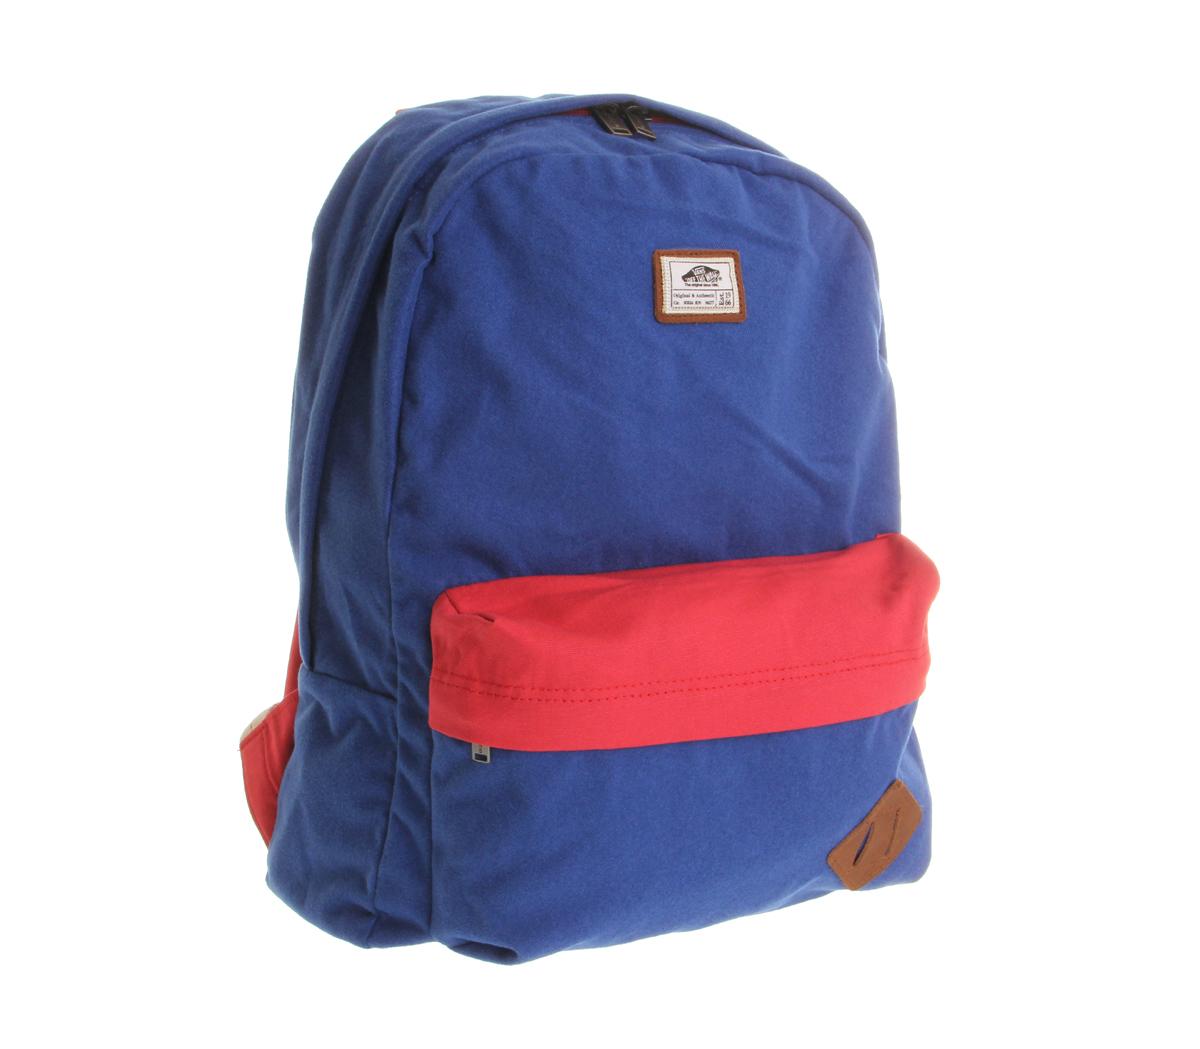 Lyst - Vans Old Skool 11 Backpack in Blue for Men e100bef43